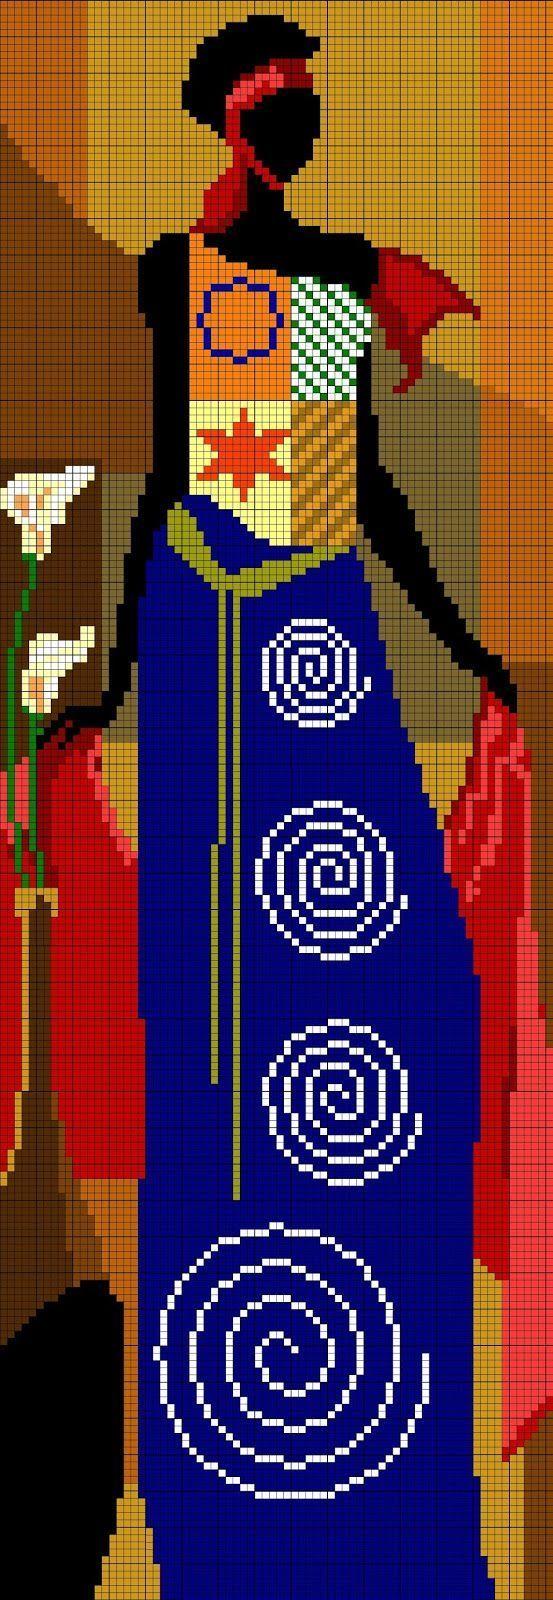 point de croix femme africaine en robe bleue - cross stitch african woman in blue dress